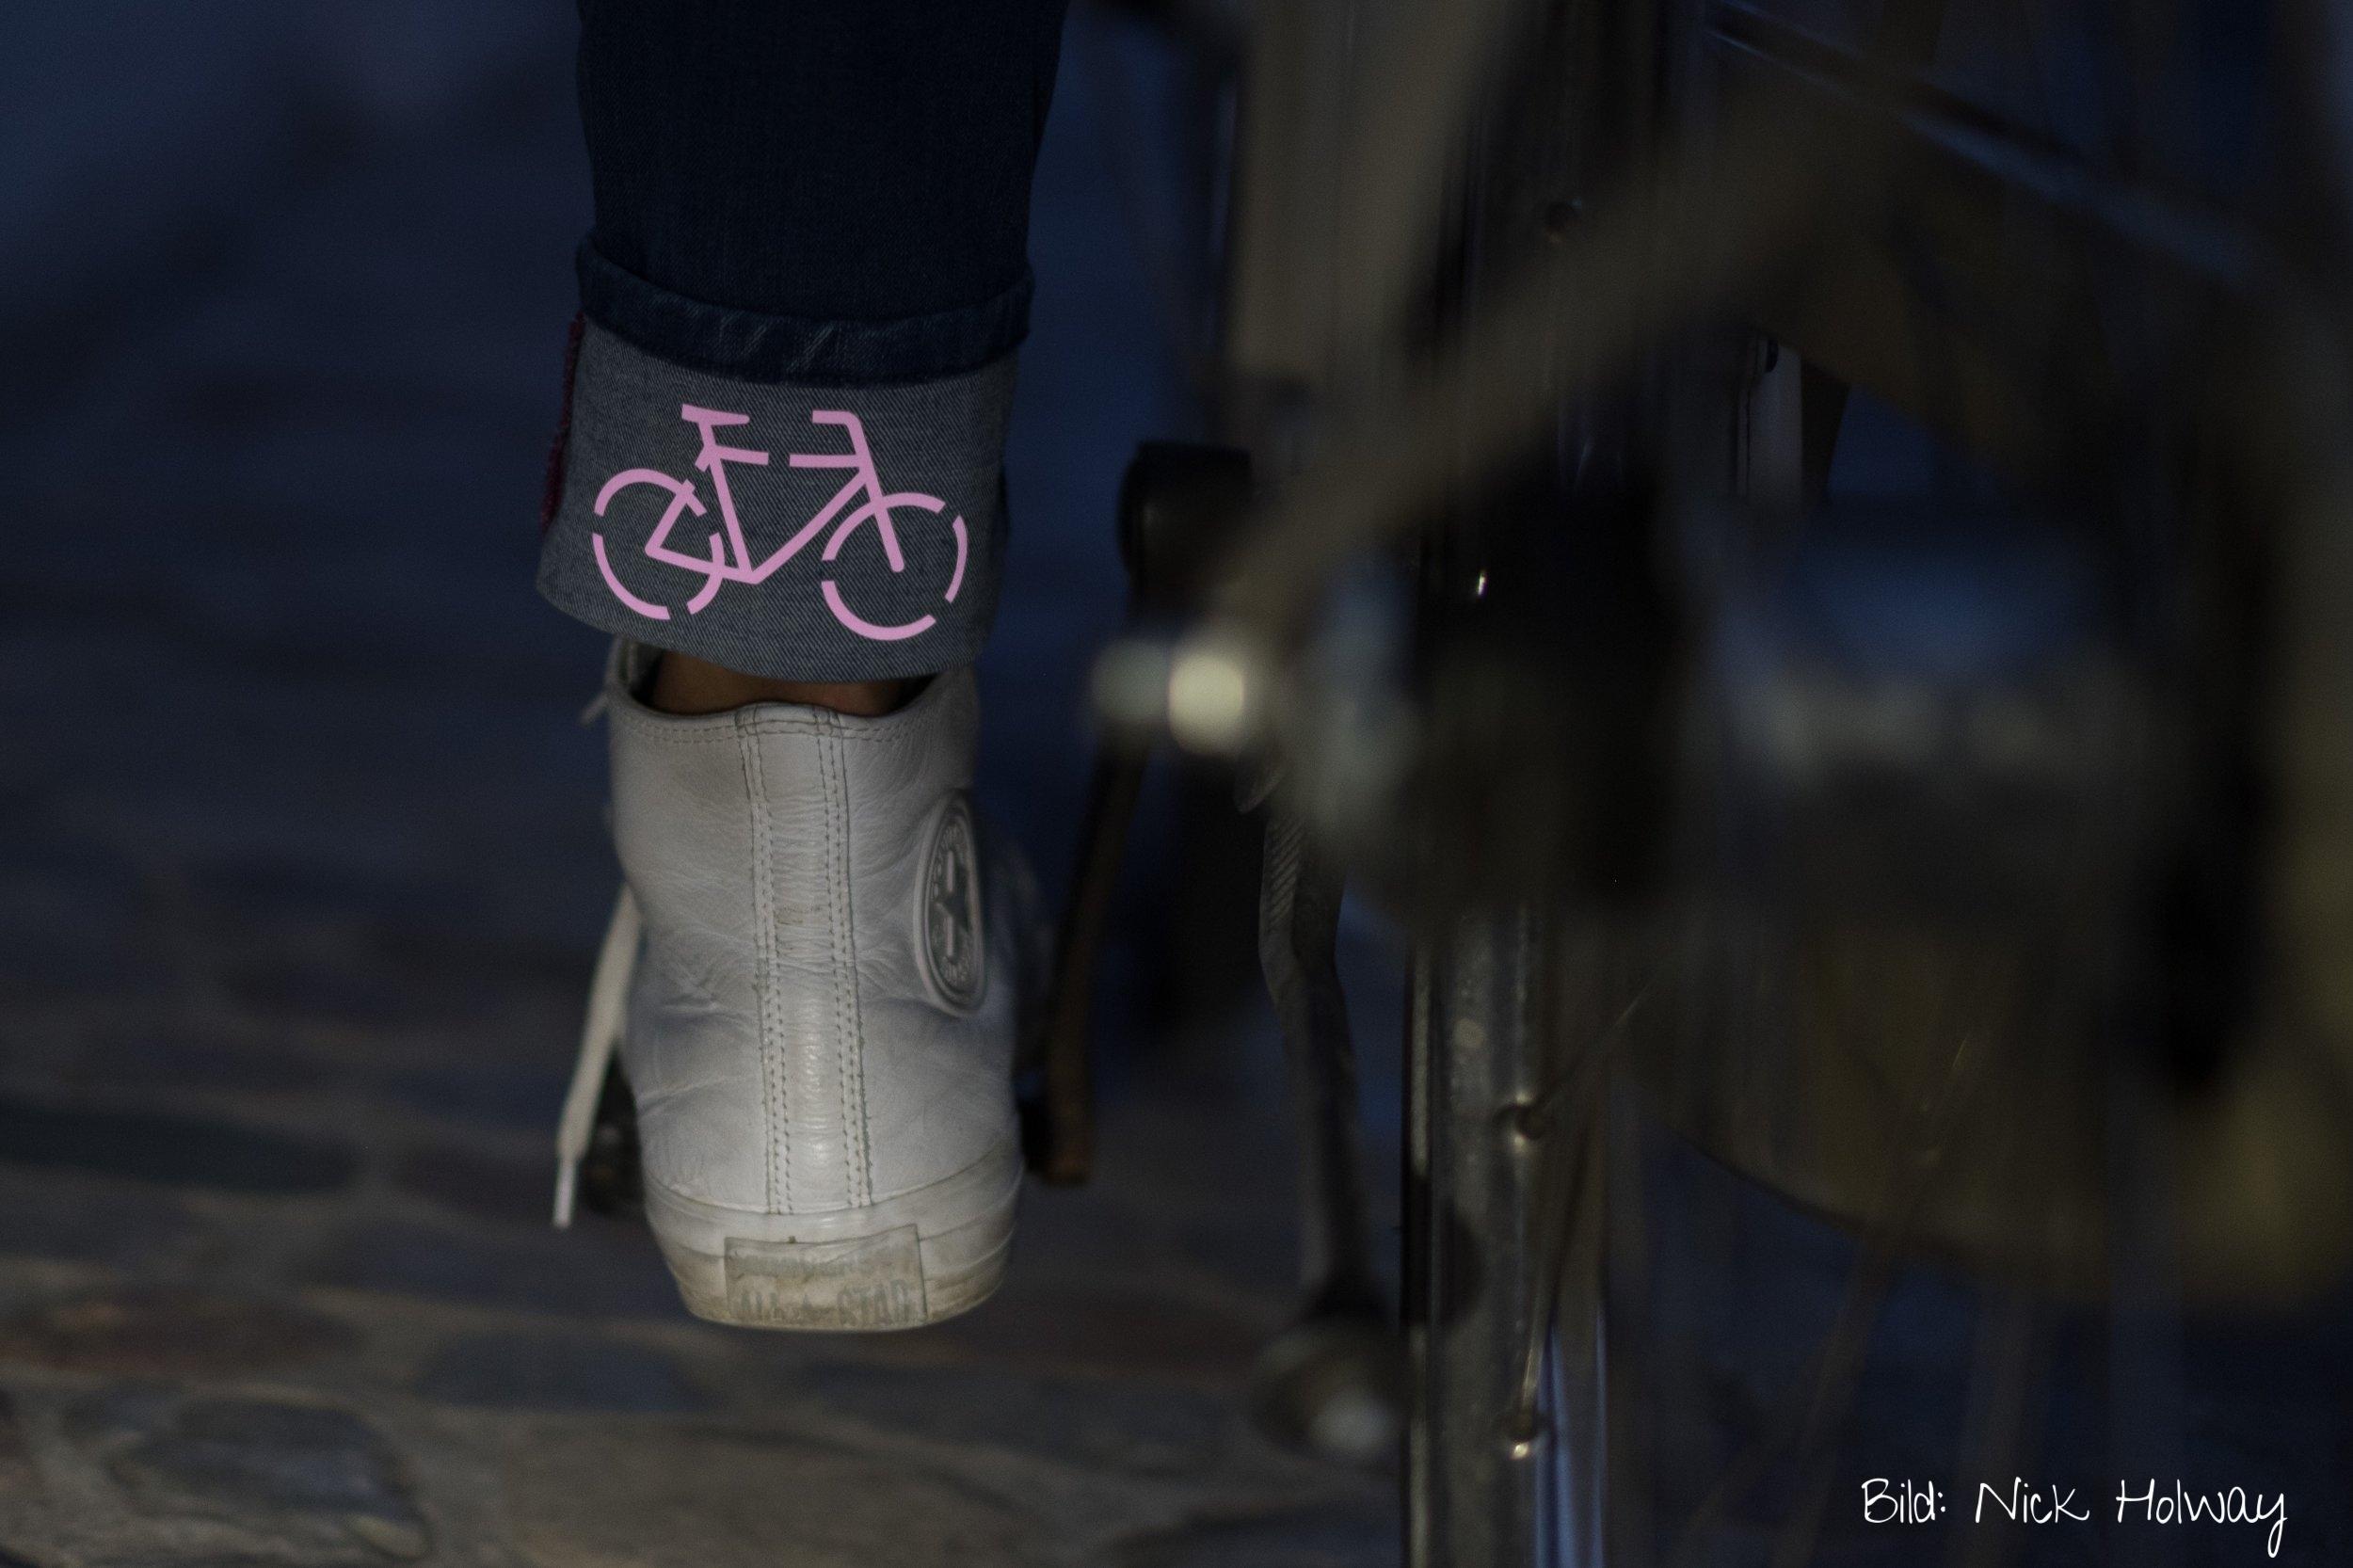 Alberto_Pants_Bicicletta_Rumpeldipumpel_2.JPG